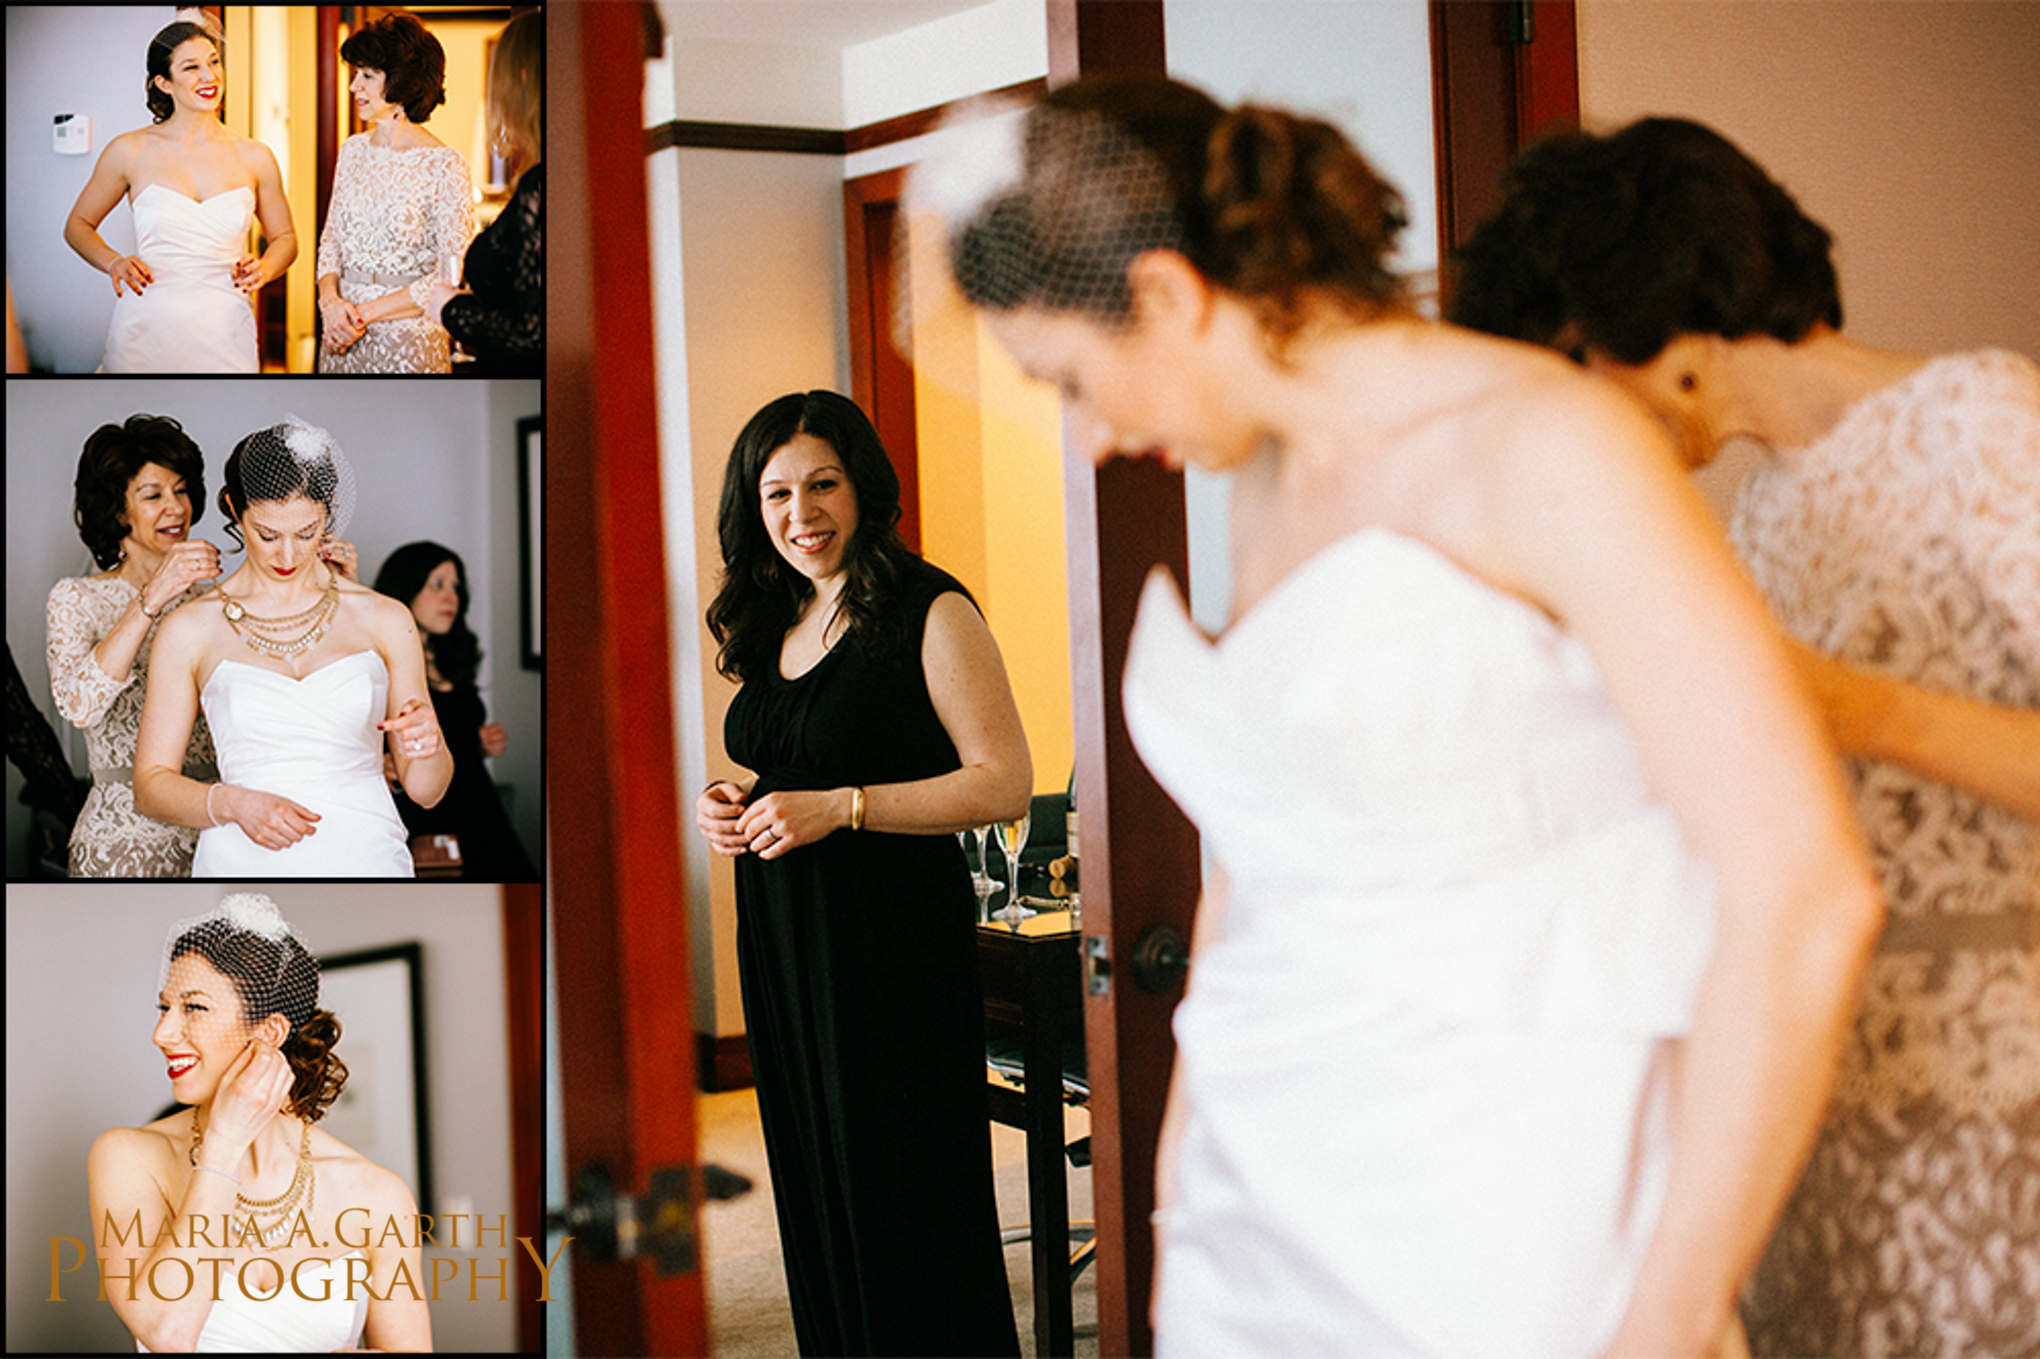 Georgetown Weddings, DC Wedding Photography, Weddings at the Ritz in DC_003.jpg